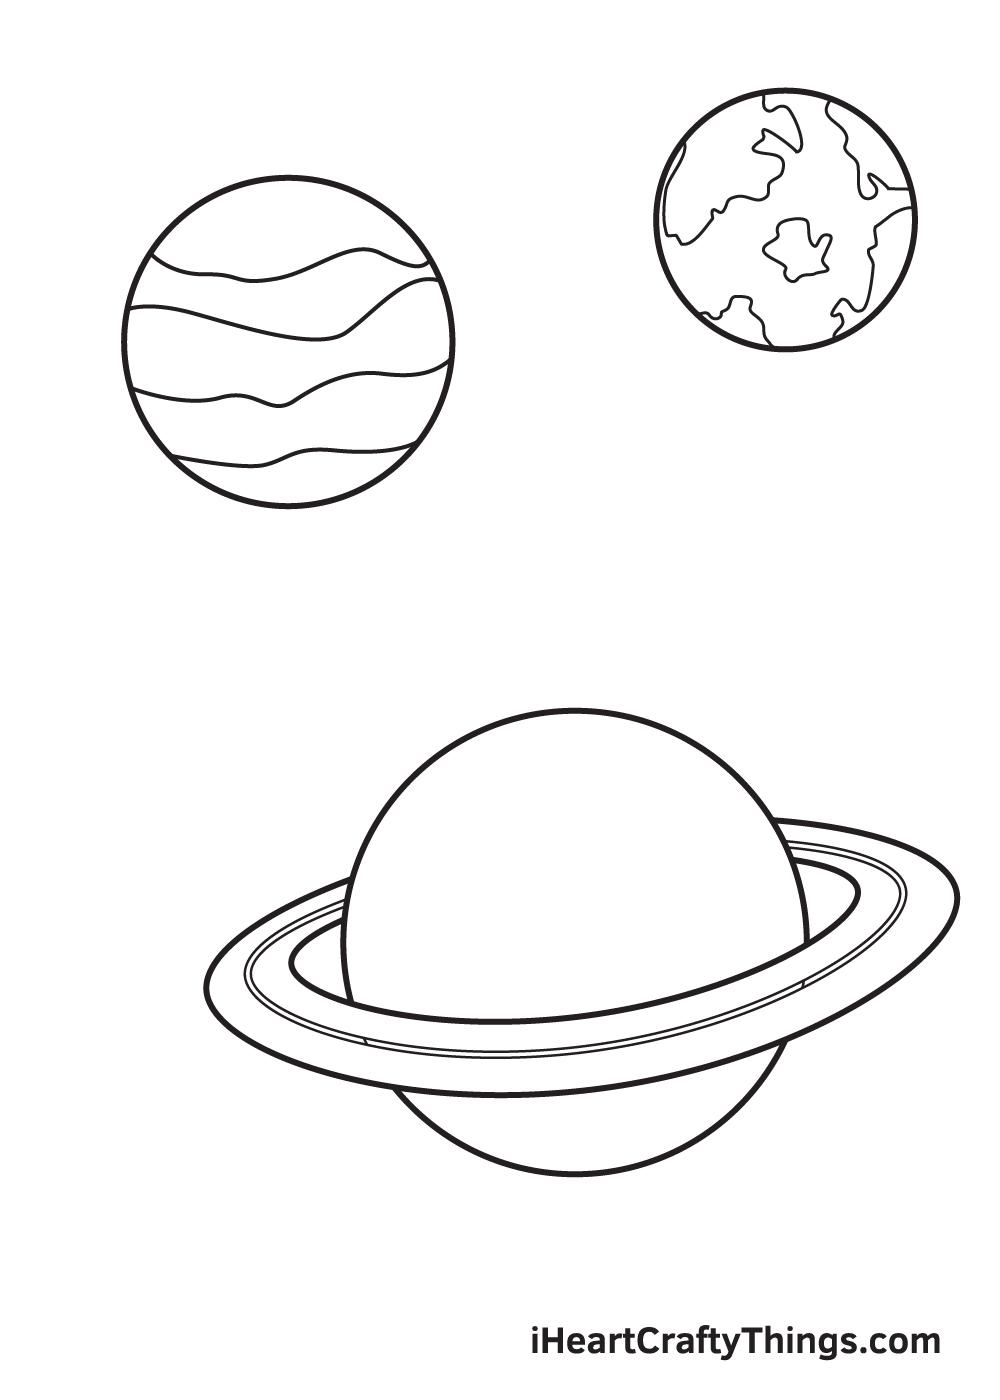 galaxy drawing - step 6